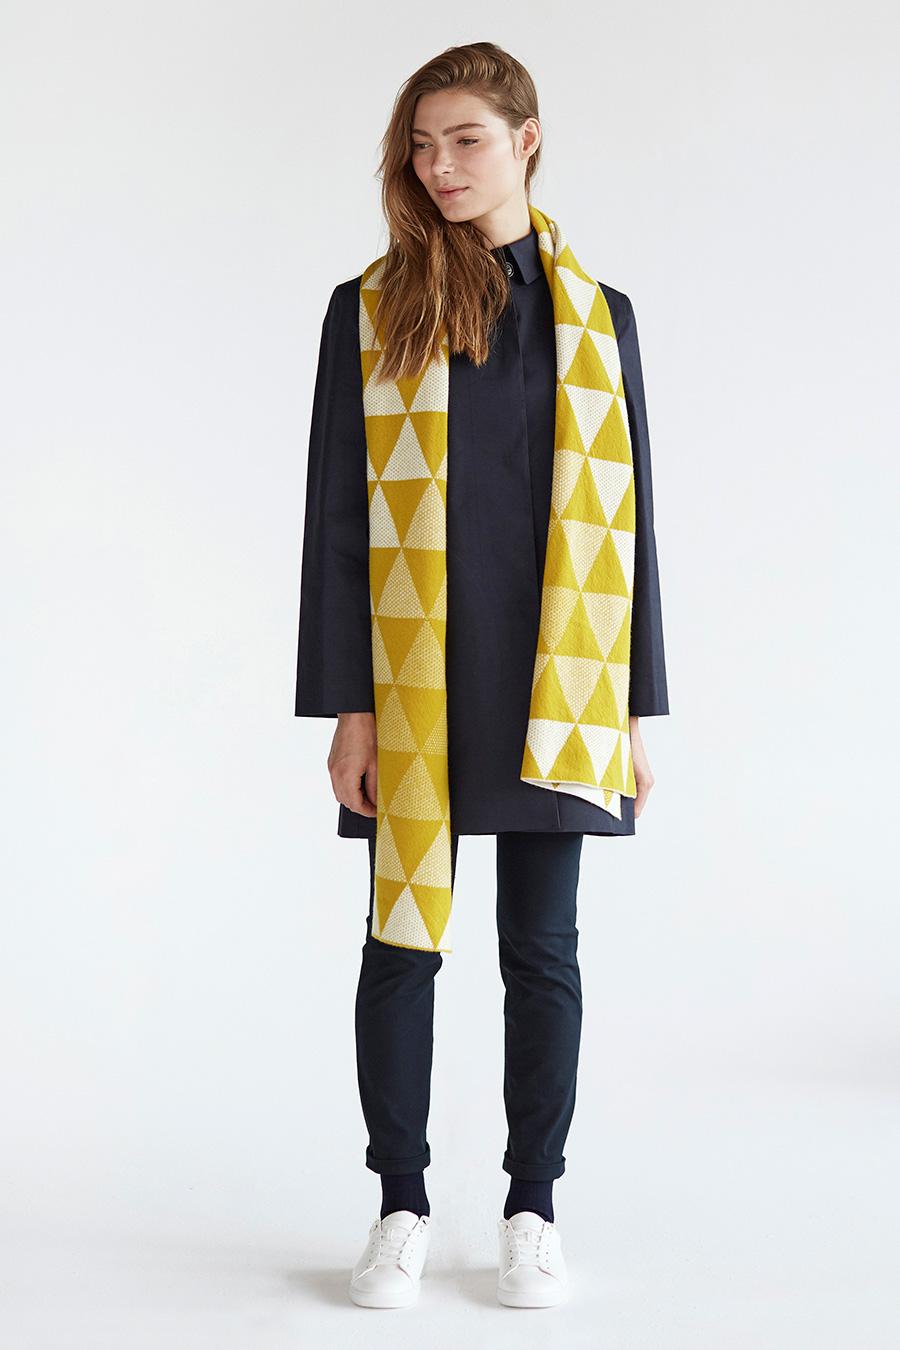 hilary-grant-scottish-knitwear-autumn-winter-201700081.jpg